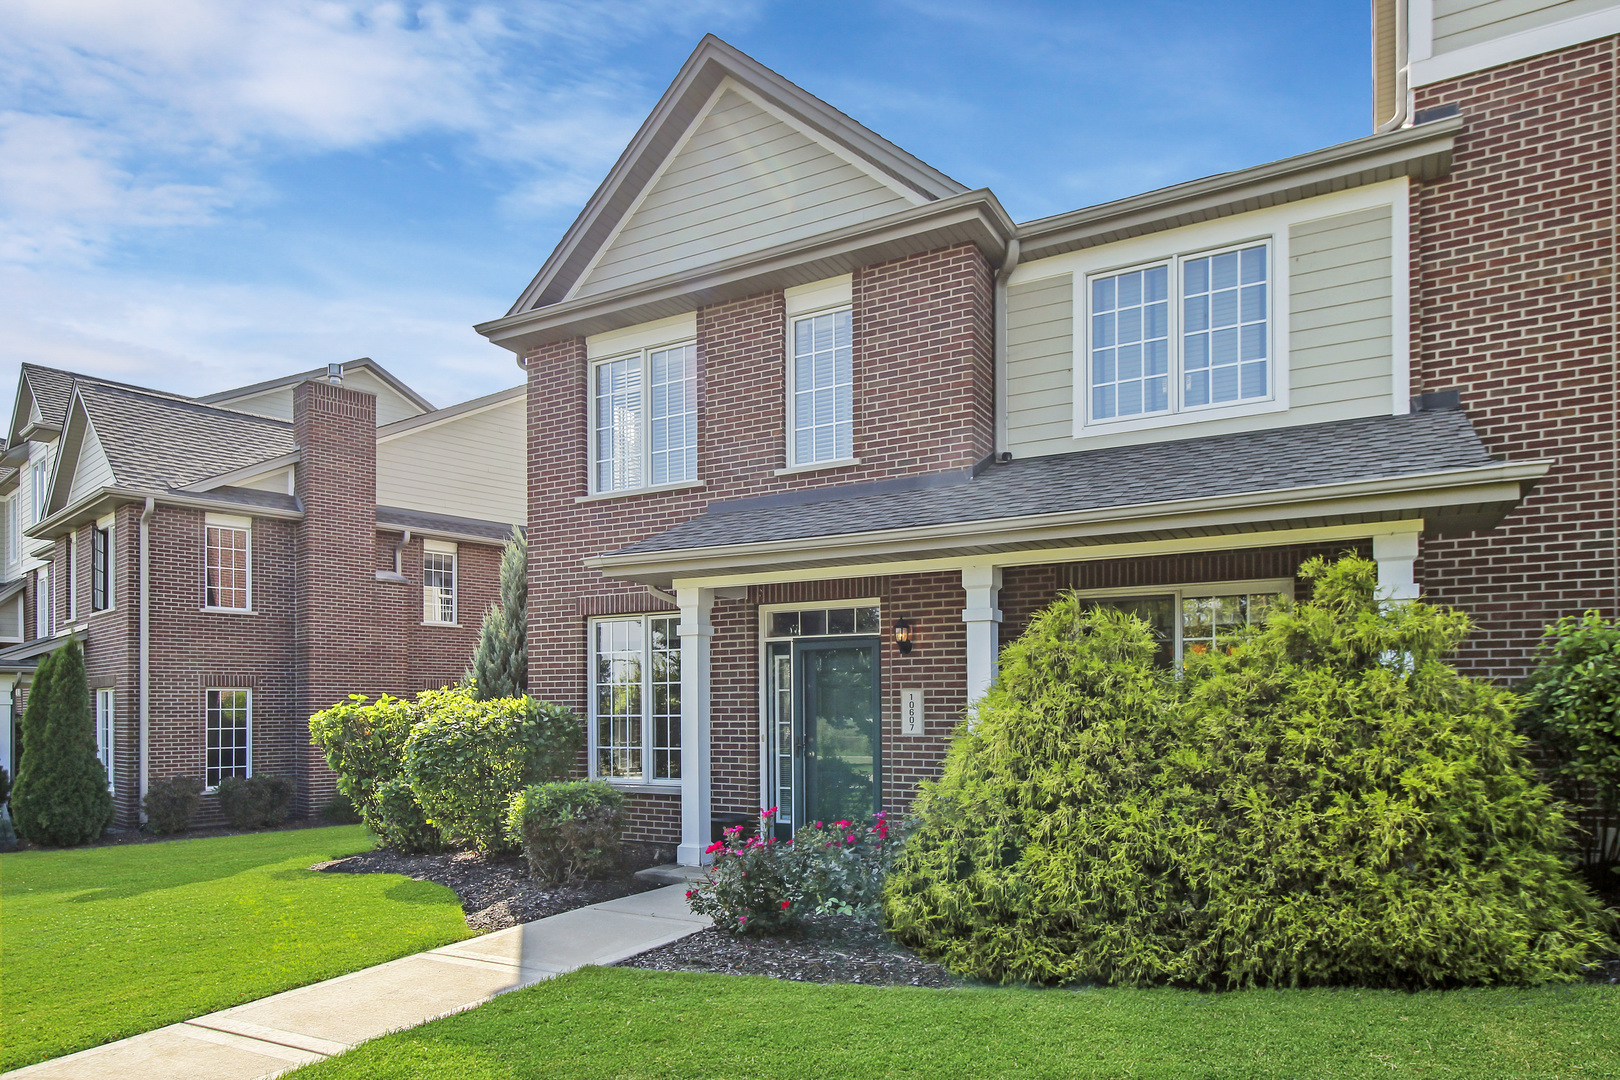 10607 Gabrielle Lane, Orland Park, Illinois